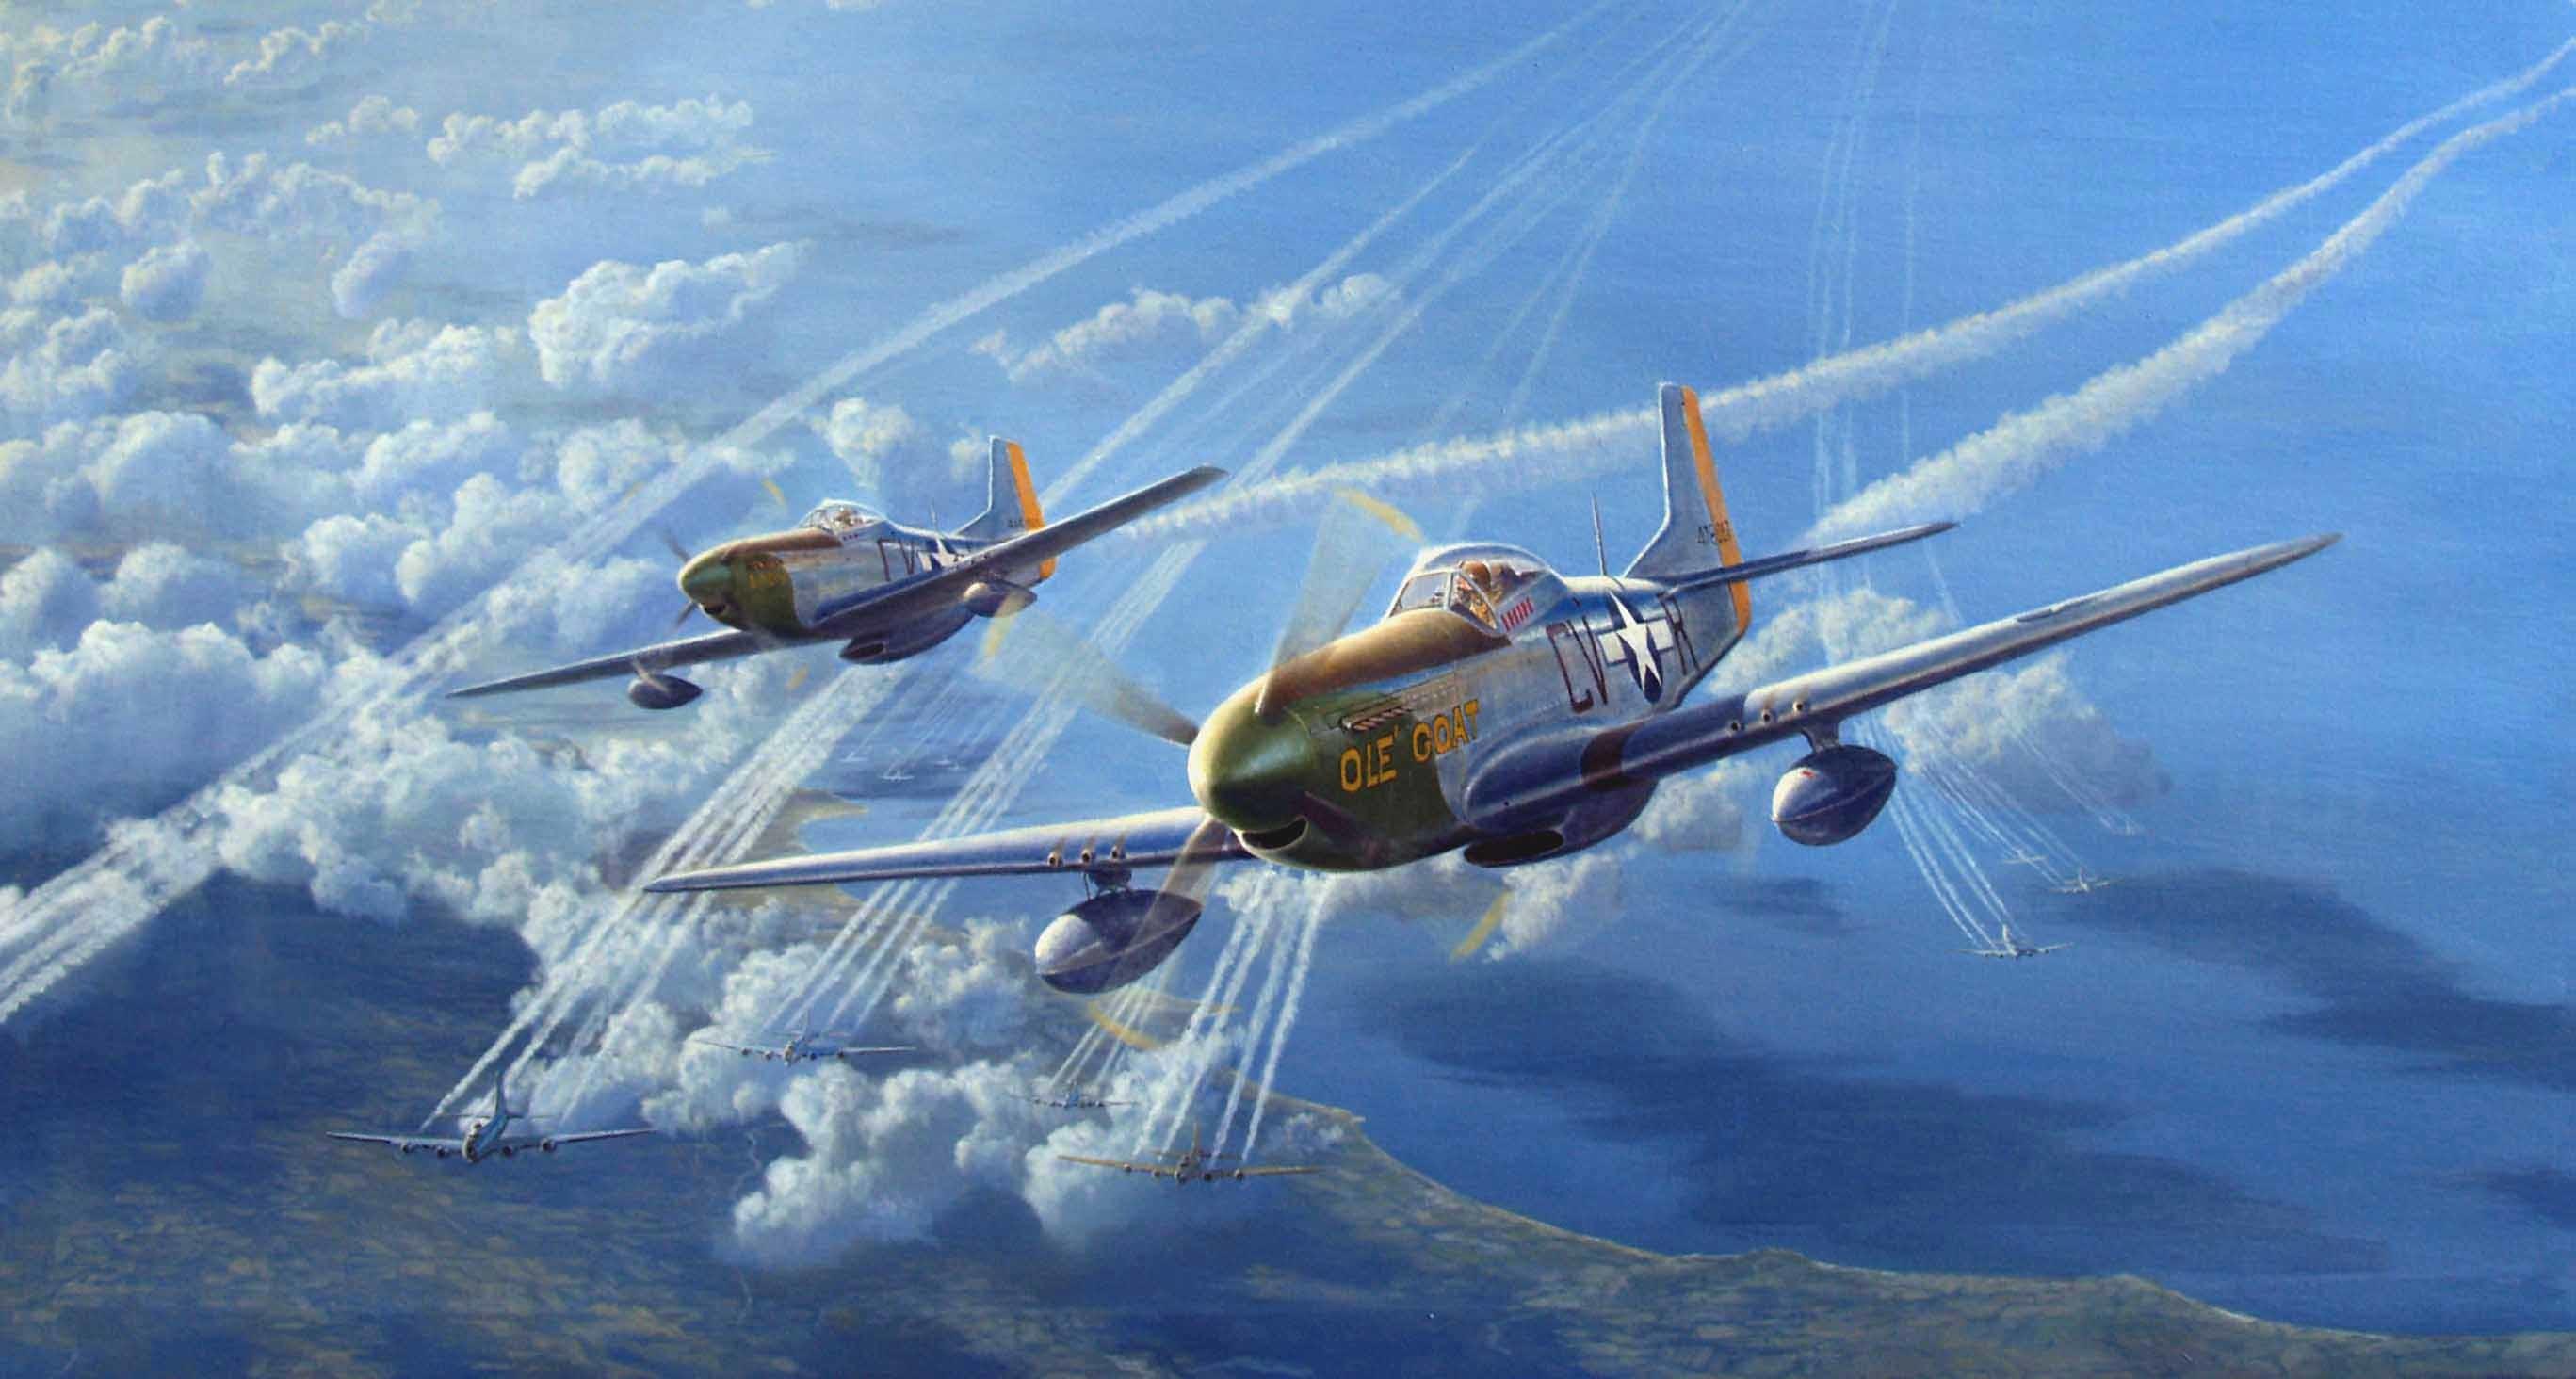 13 North American P-51 Mustang Wallpapers | North American P-51 .